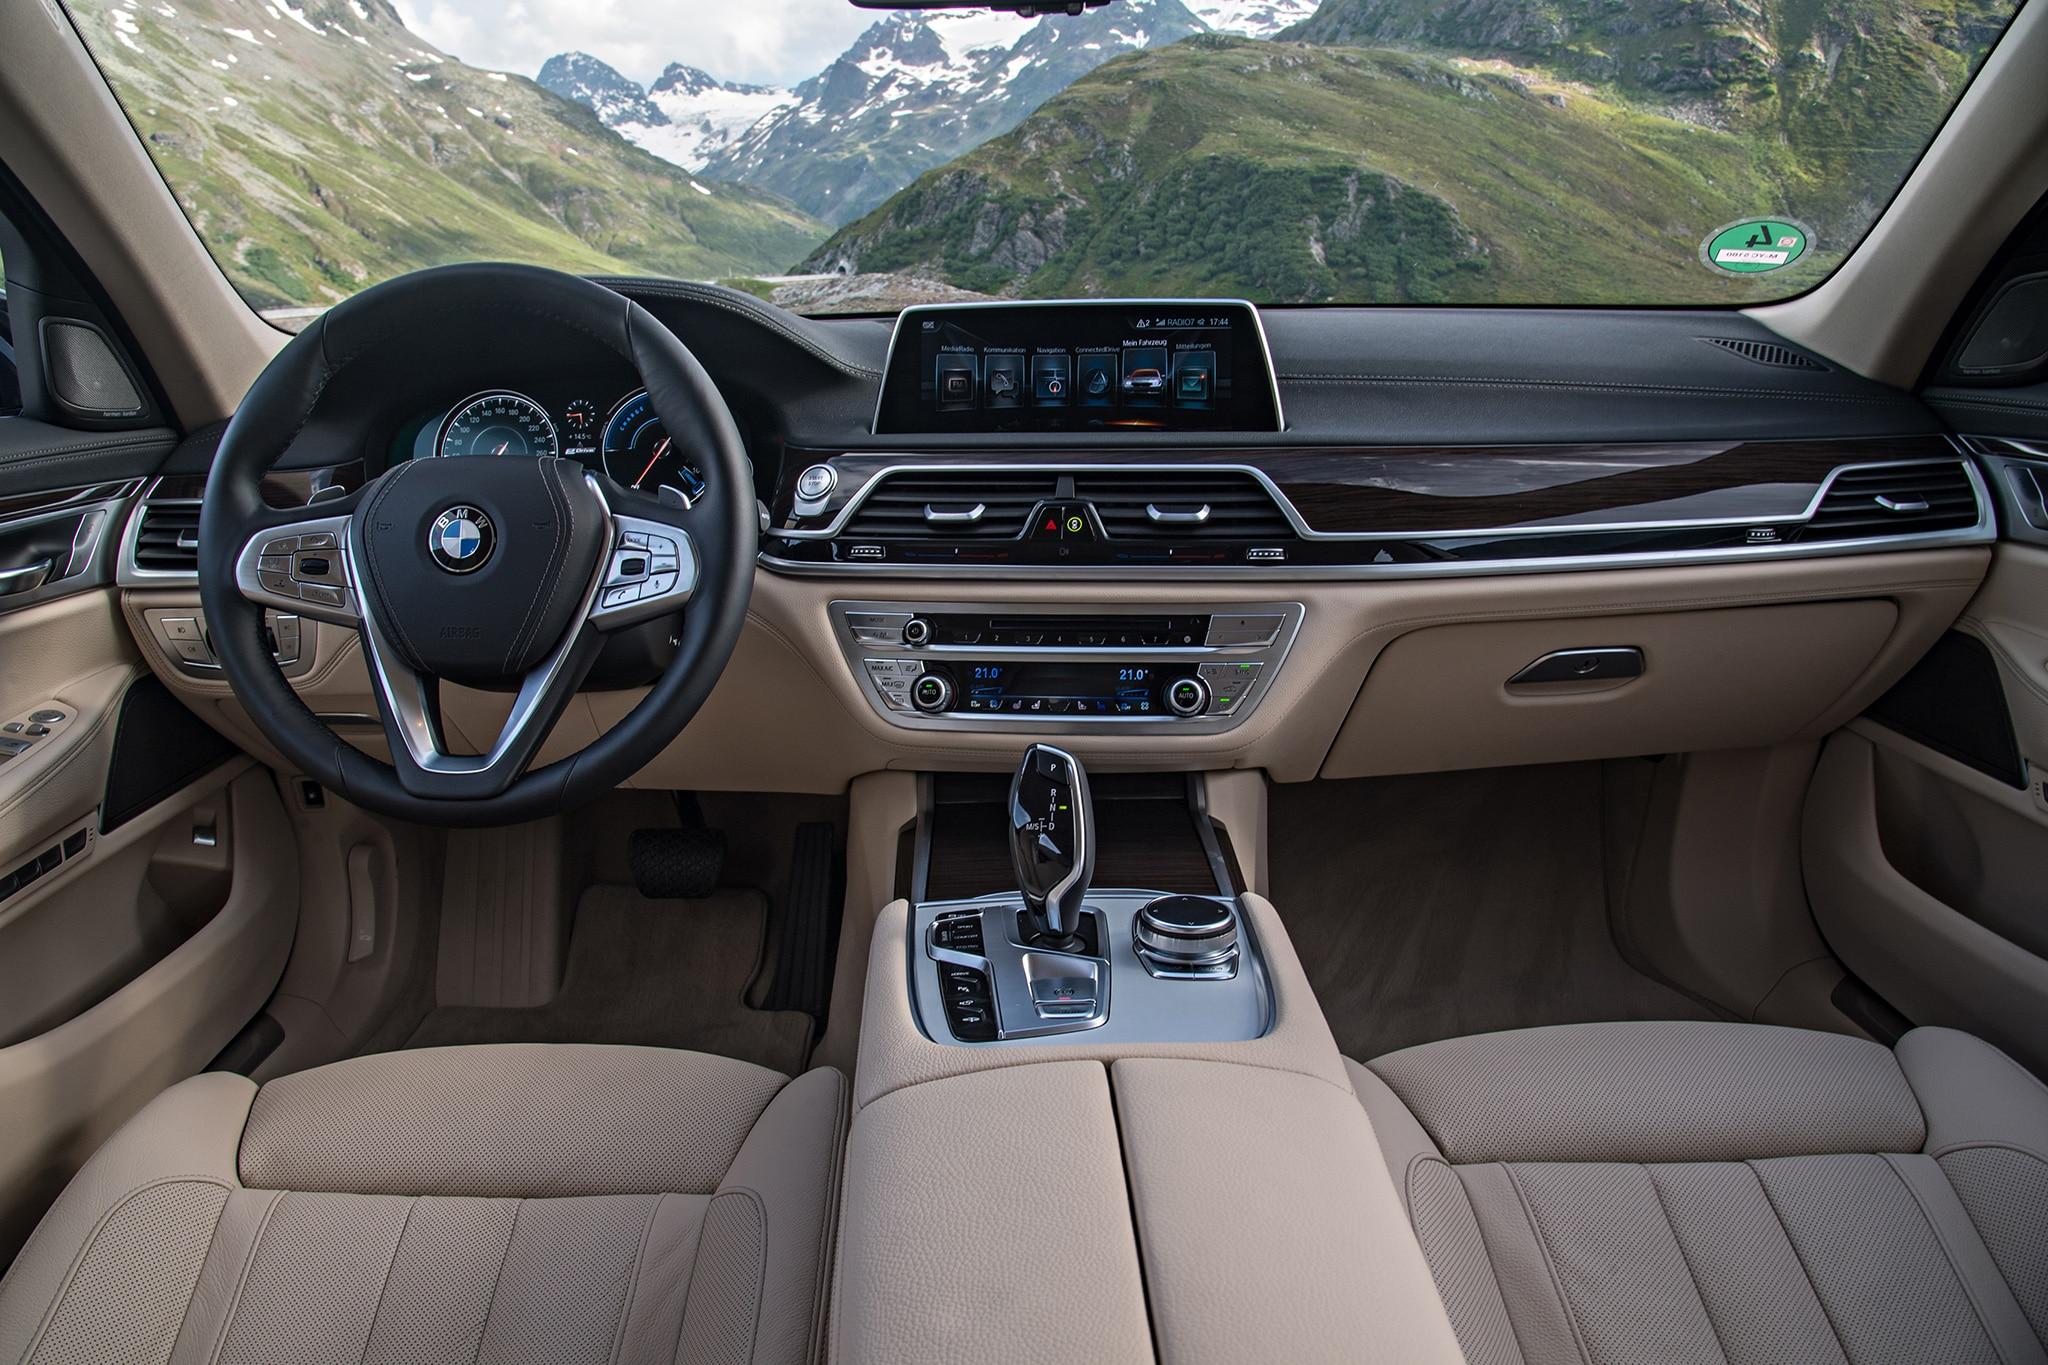 2017 BMW 740e xDrive iPerformance plug in hybrid cabin 01